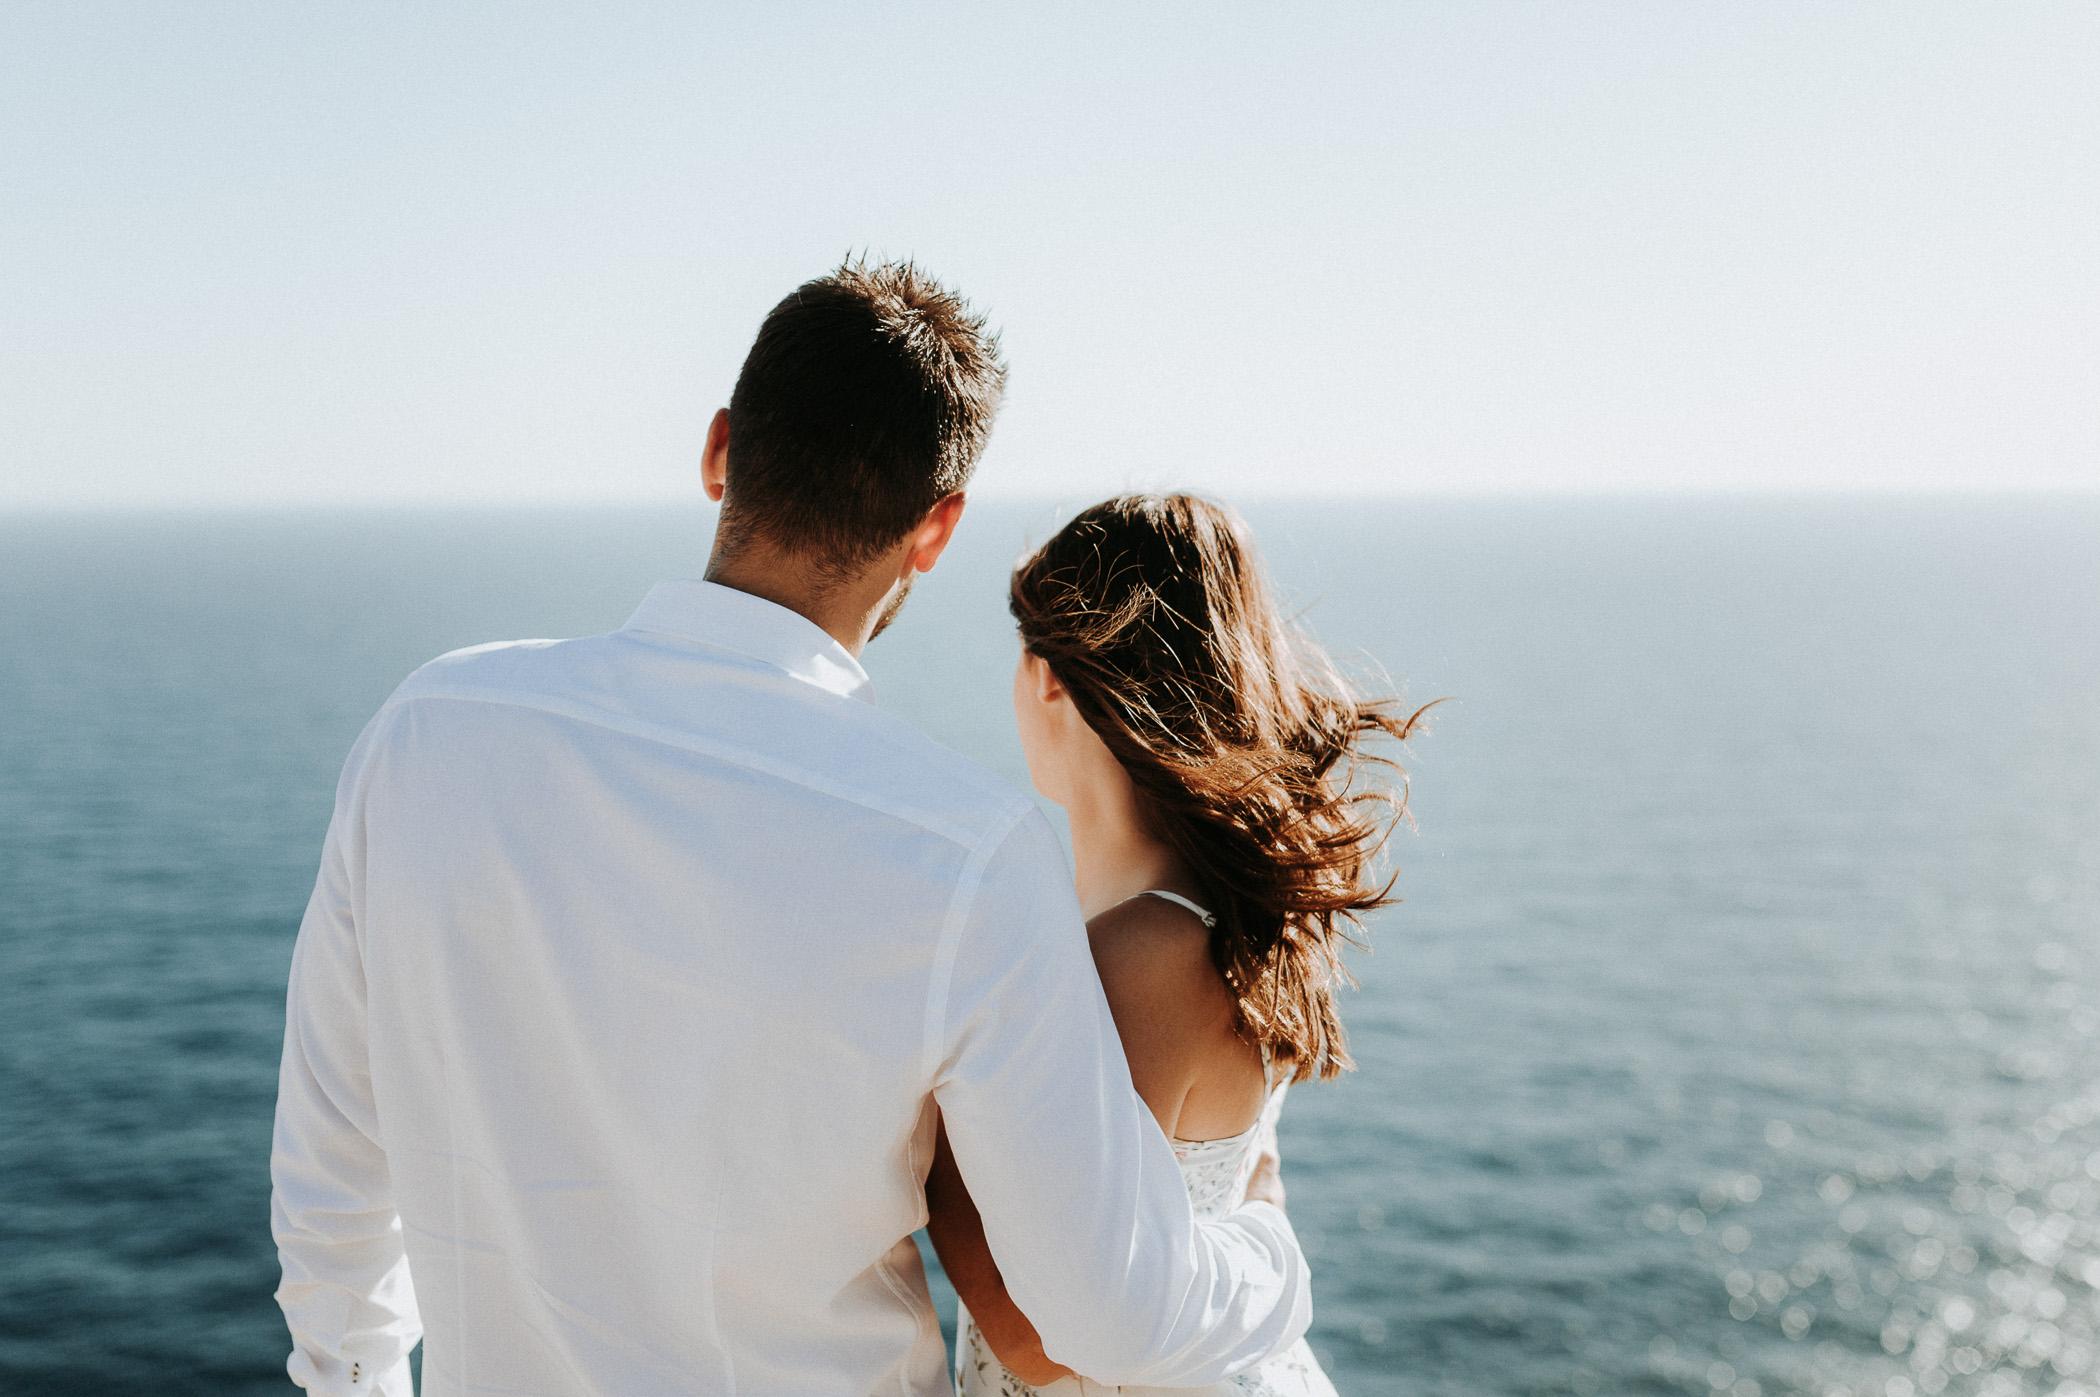 DanielaMarquardtPhotography_wedding_elopement_mallorca_spain_calapi_palma_lauraandtoni_17